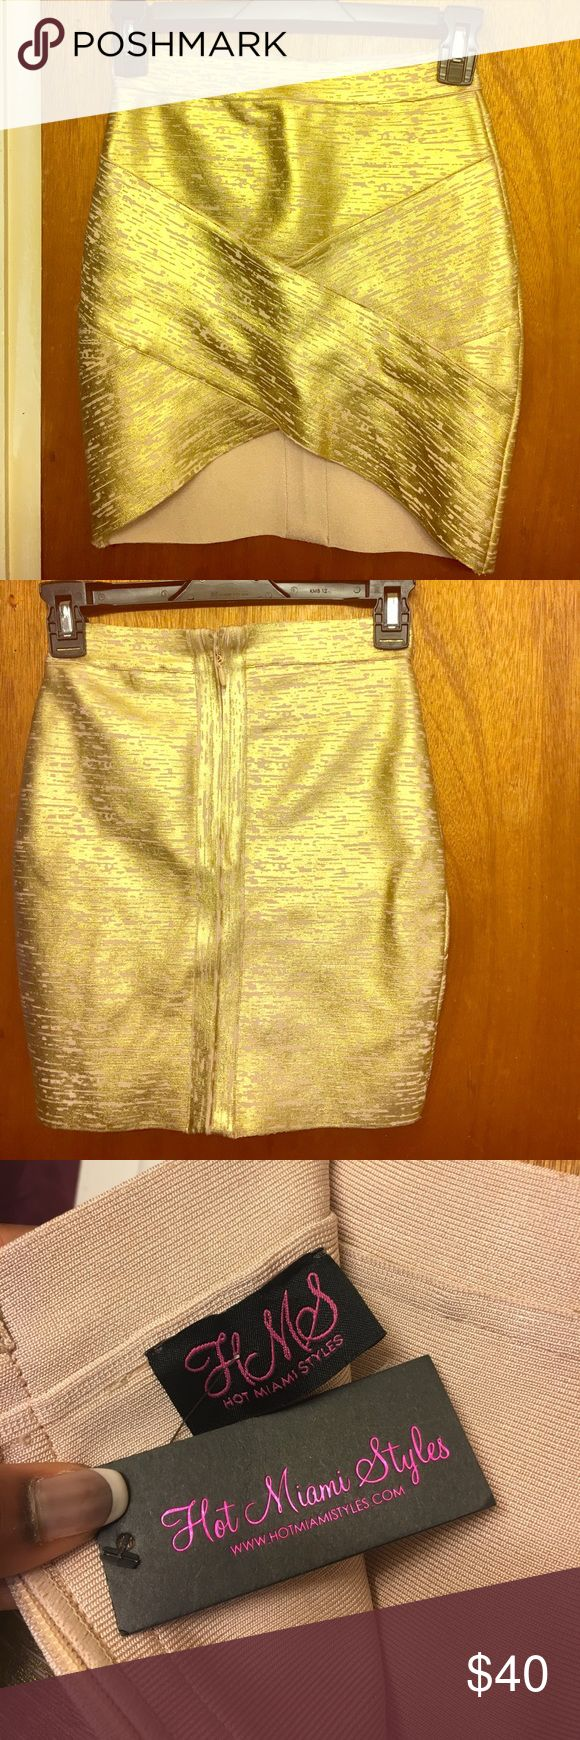 NWT Hot Miami Styles Gold Bandage skirt size Med New With Tags Hot Miami Styles Gold Bandage Mini skirt. Size Medium. High- Low style. Super sexy Hot Miami Styles Skirts Mini